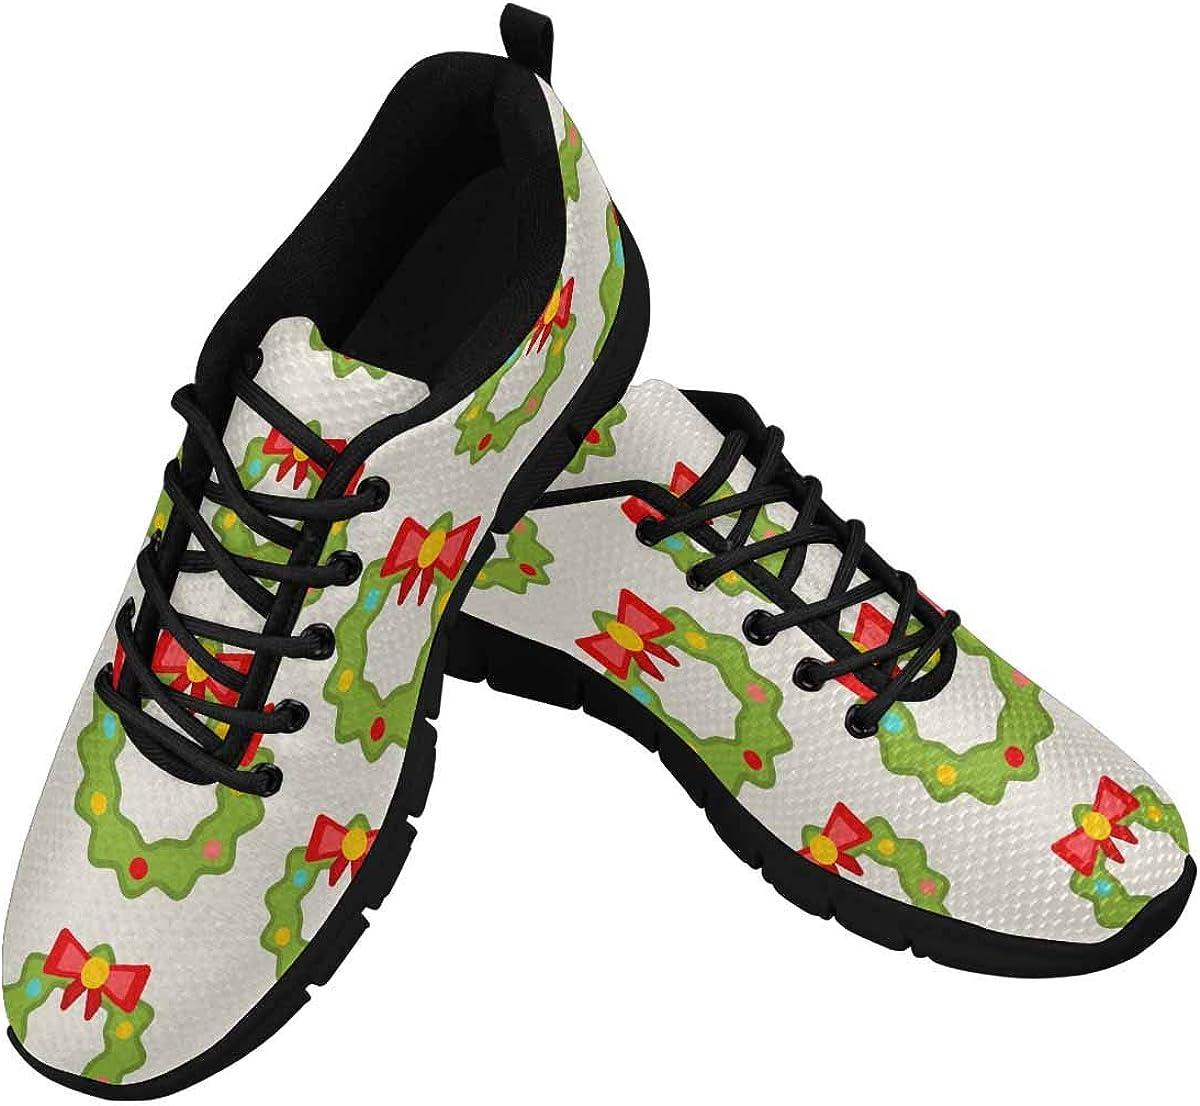 INTERESTPRINT Christmas Wreathes, Nature Women's Athletic Walking Shoes Breathe Comfort Mesh